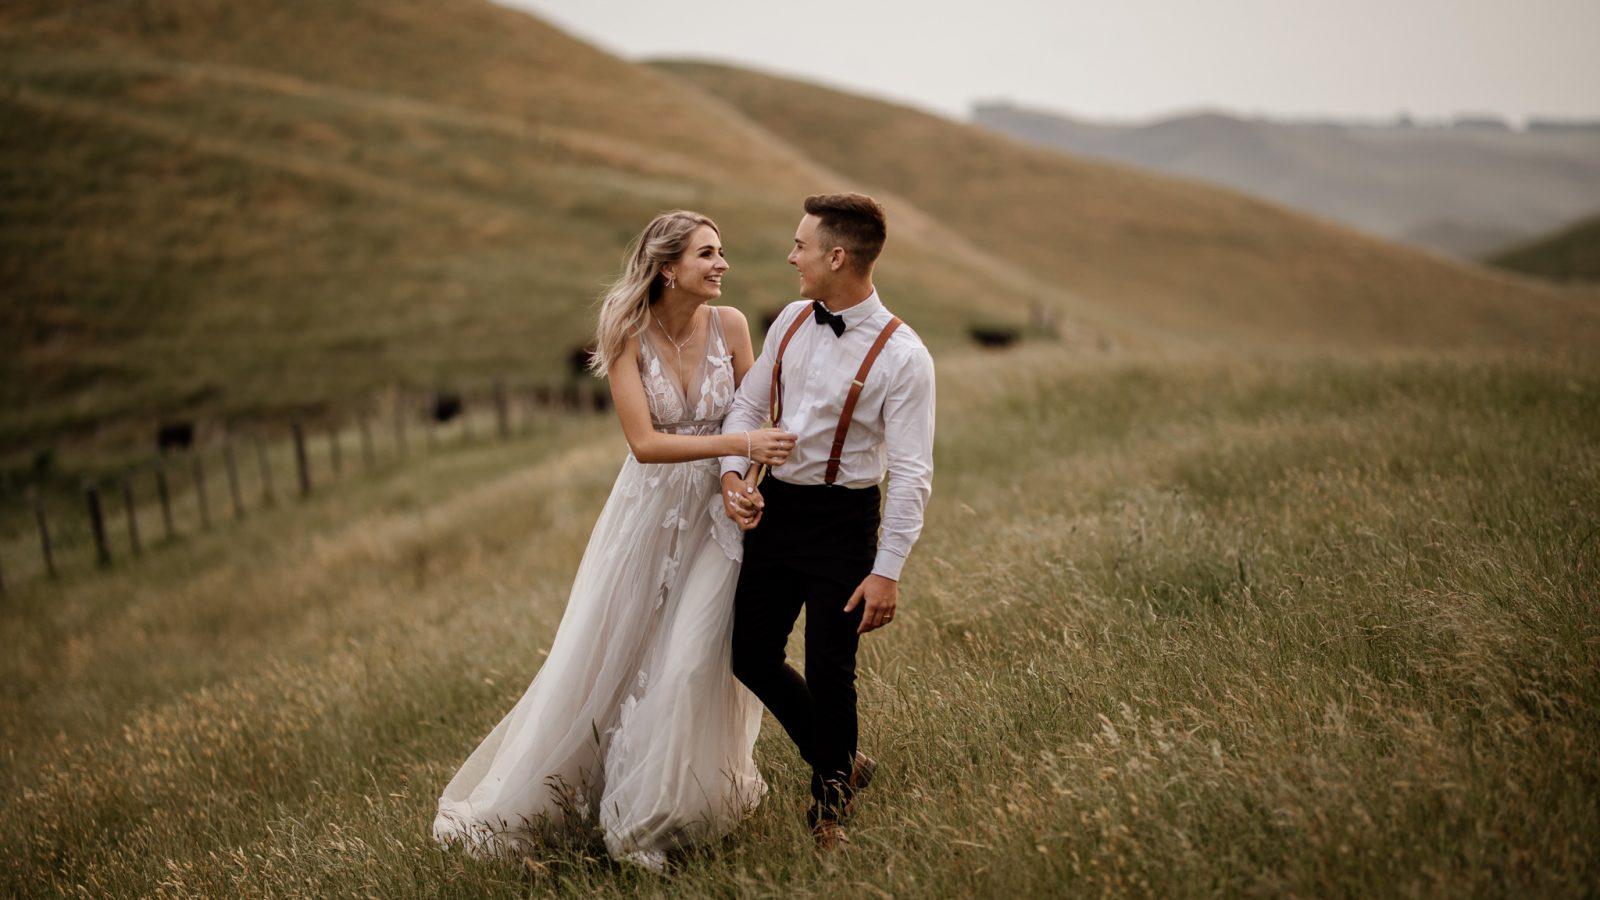 Waiterenui Wedding Venue Hawkes Bay hills couple walking laughing